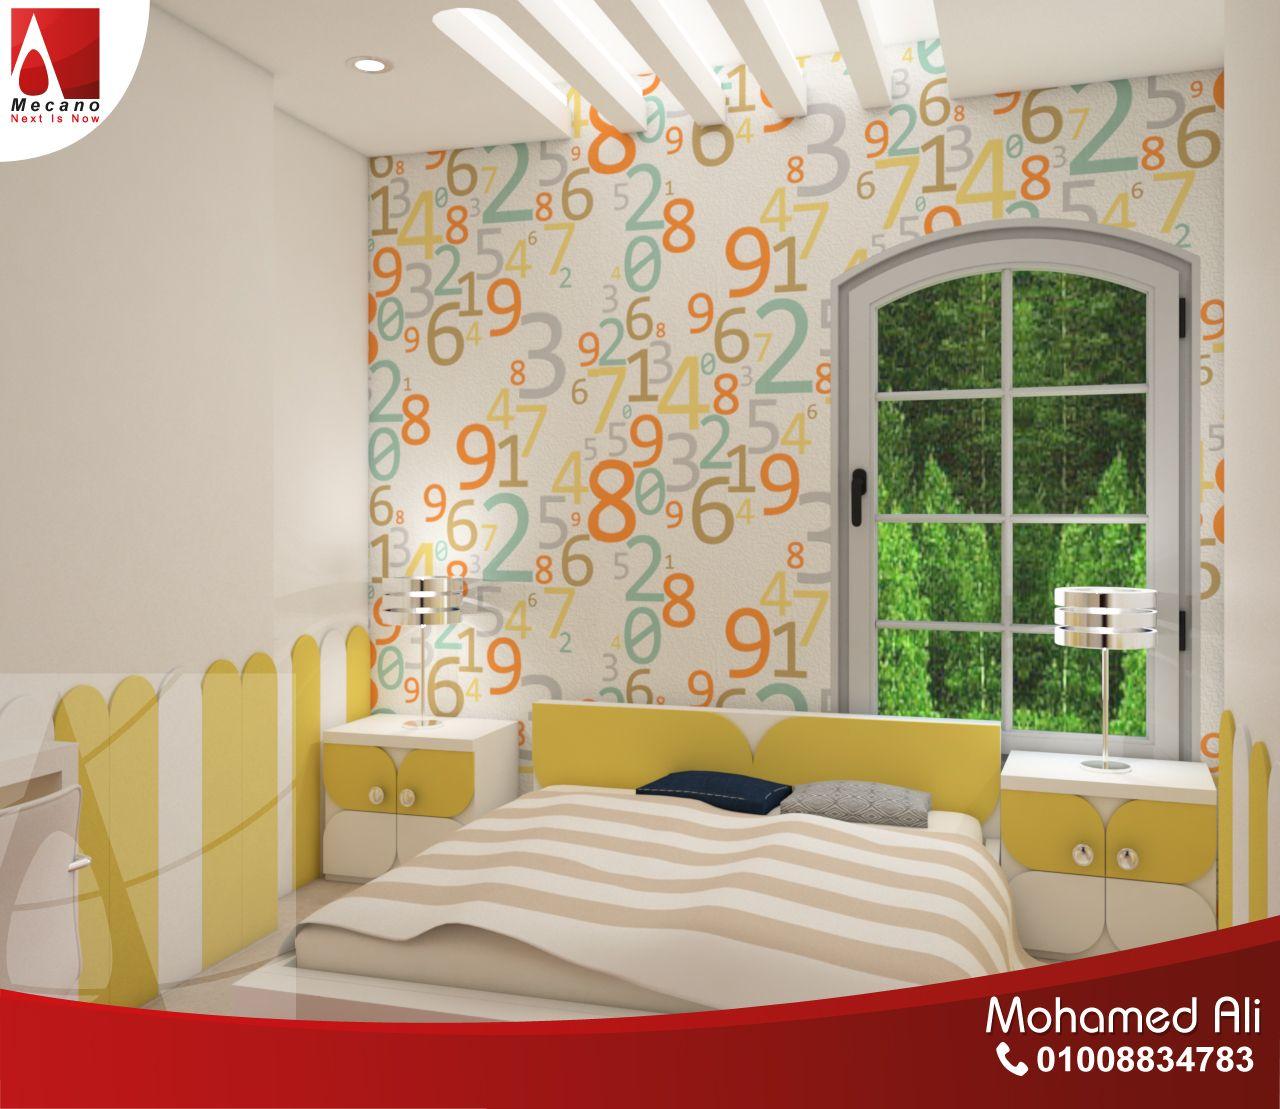 غرفة اطفال مودرن ستايل Home Furniture Home Decor